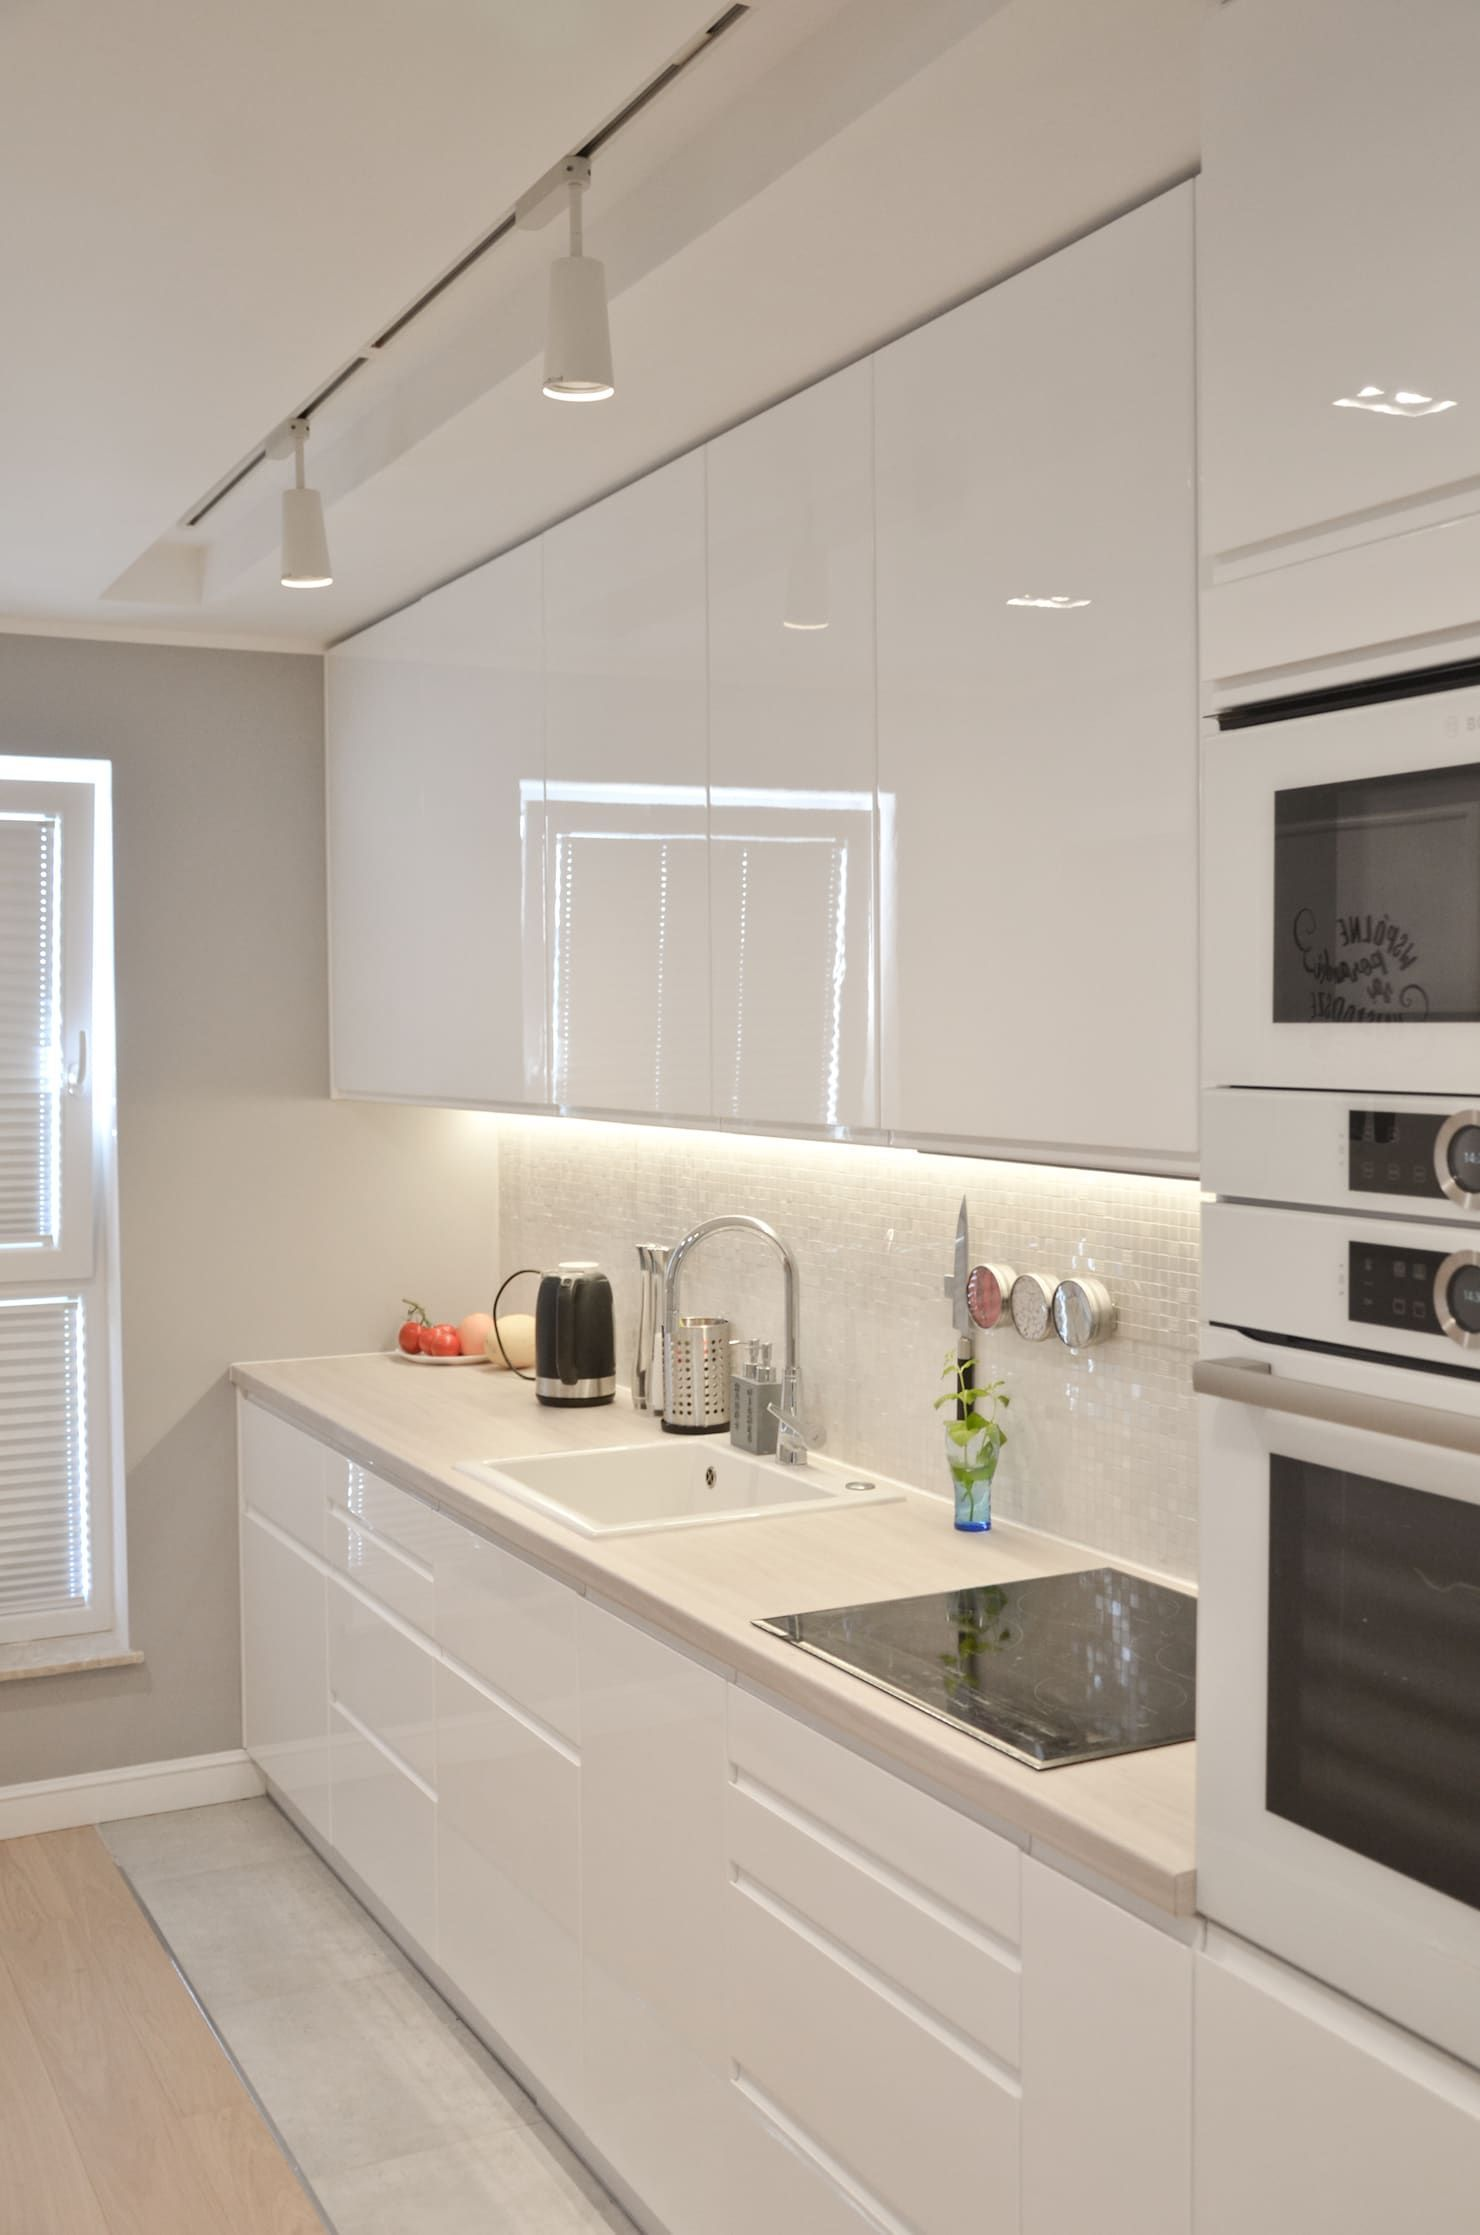 10 Layouts Perfect for Your Tiny Cooking area  #kitchen#kitchenbacksplash#kitchenlightfixtures#kitchenpendantlighting#kitchenflooring #contemporarykitcheninterior